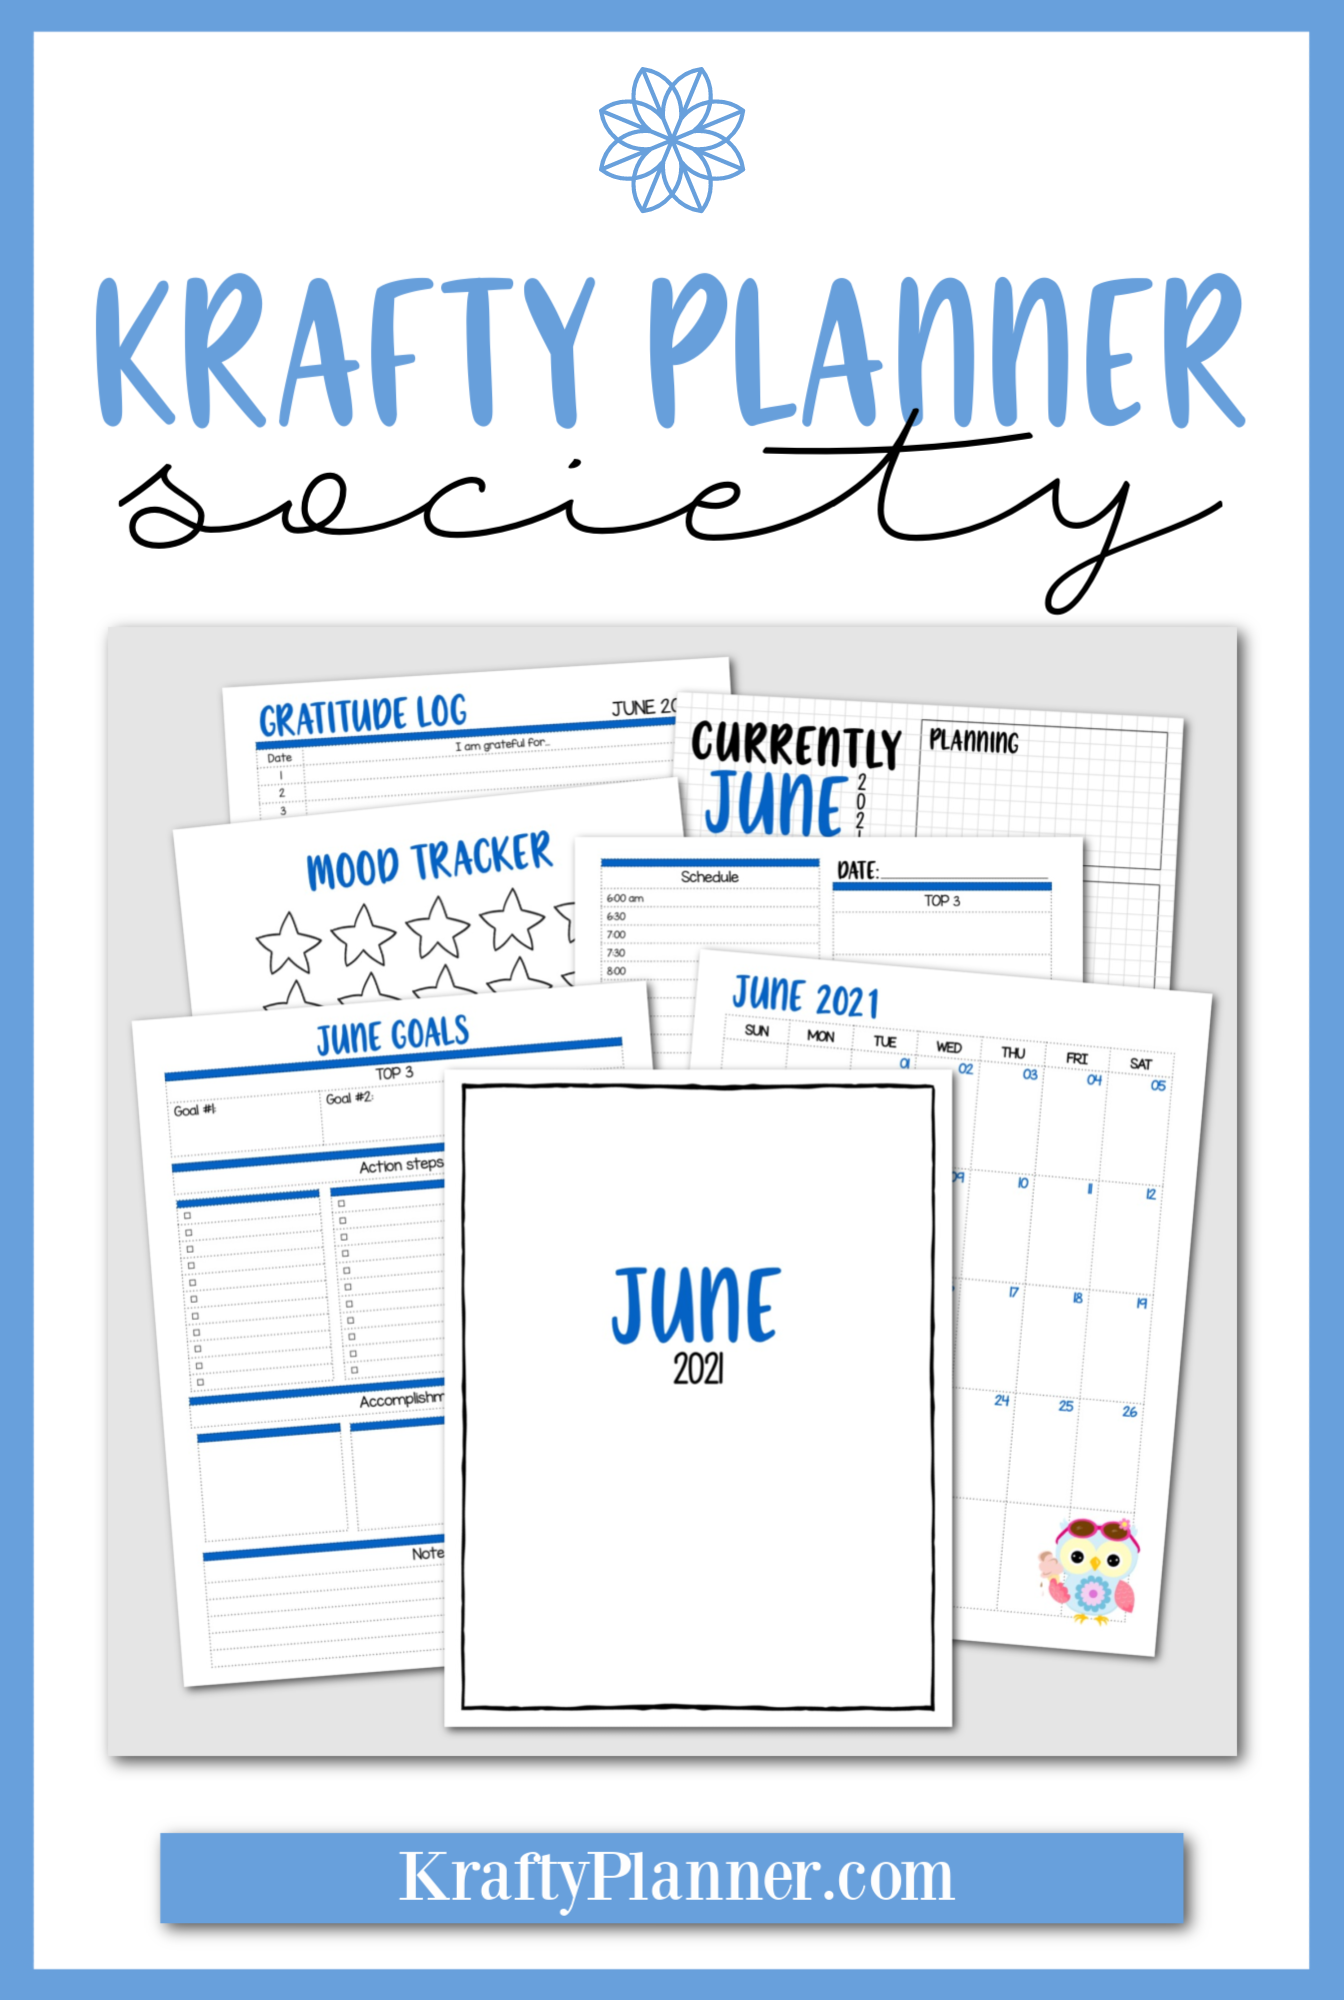 June 2021 Krafty Planner Society PIN 2 copy.png